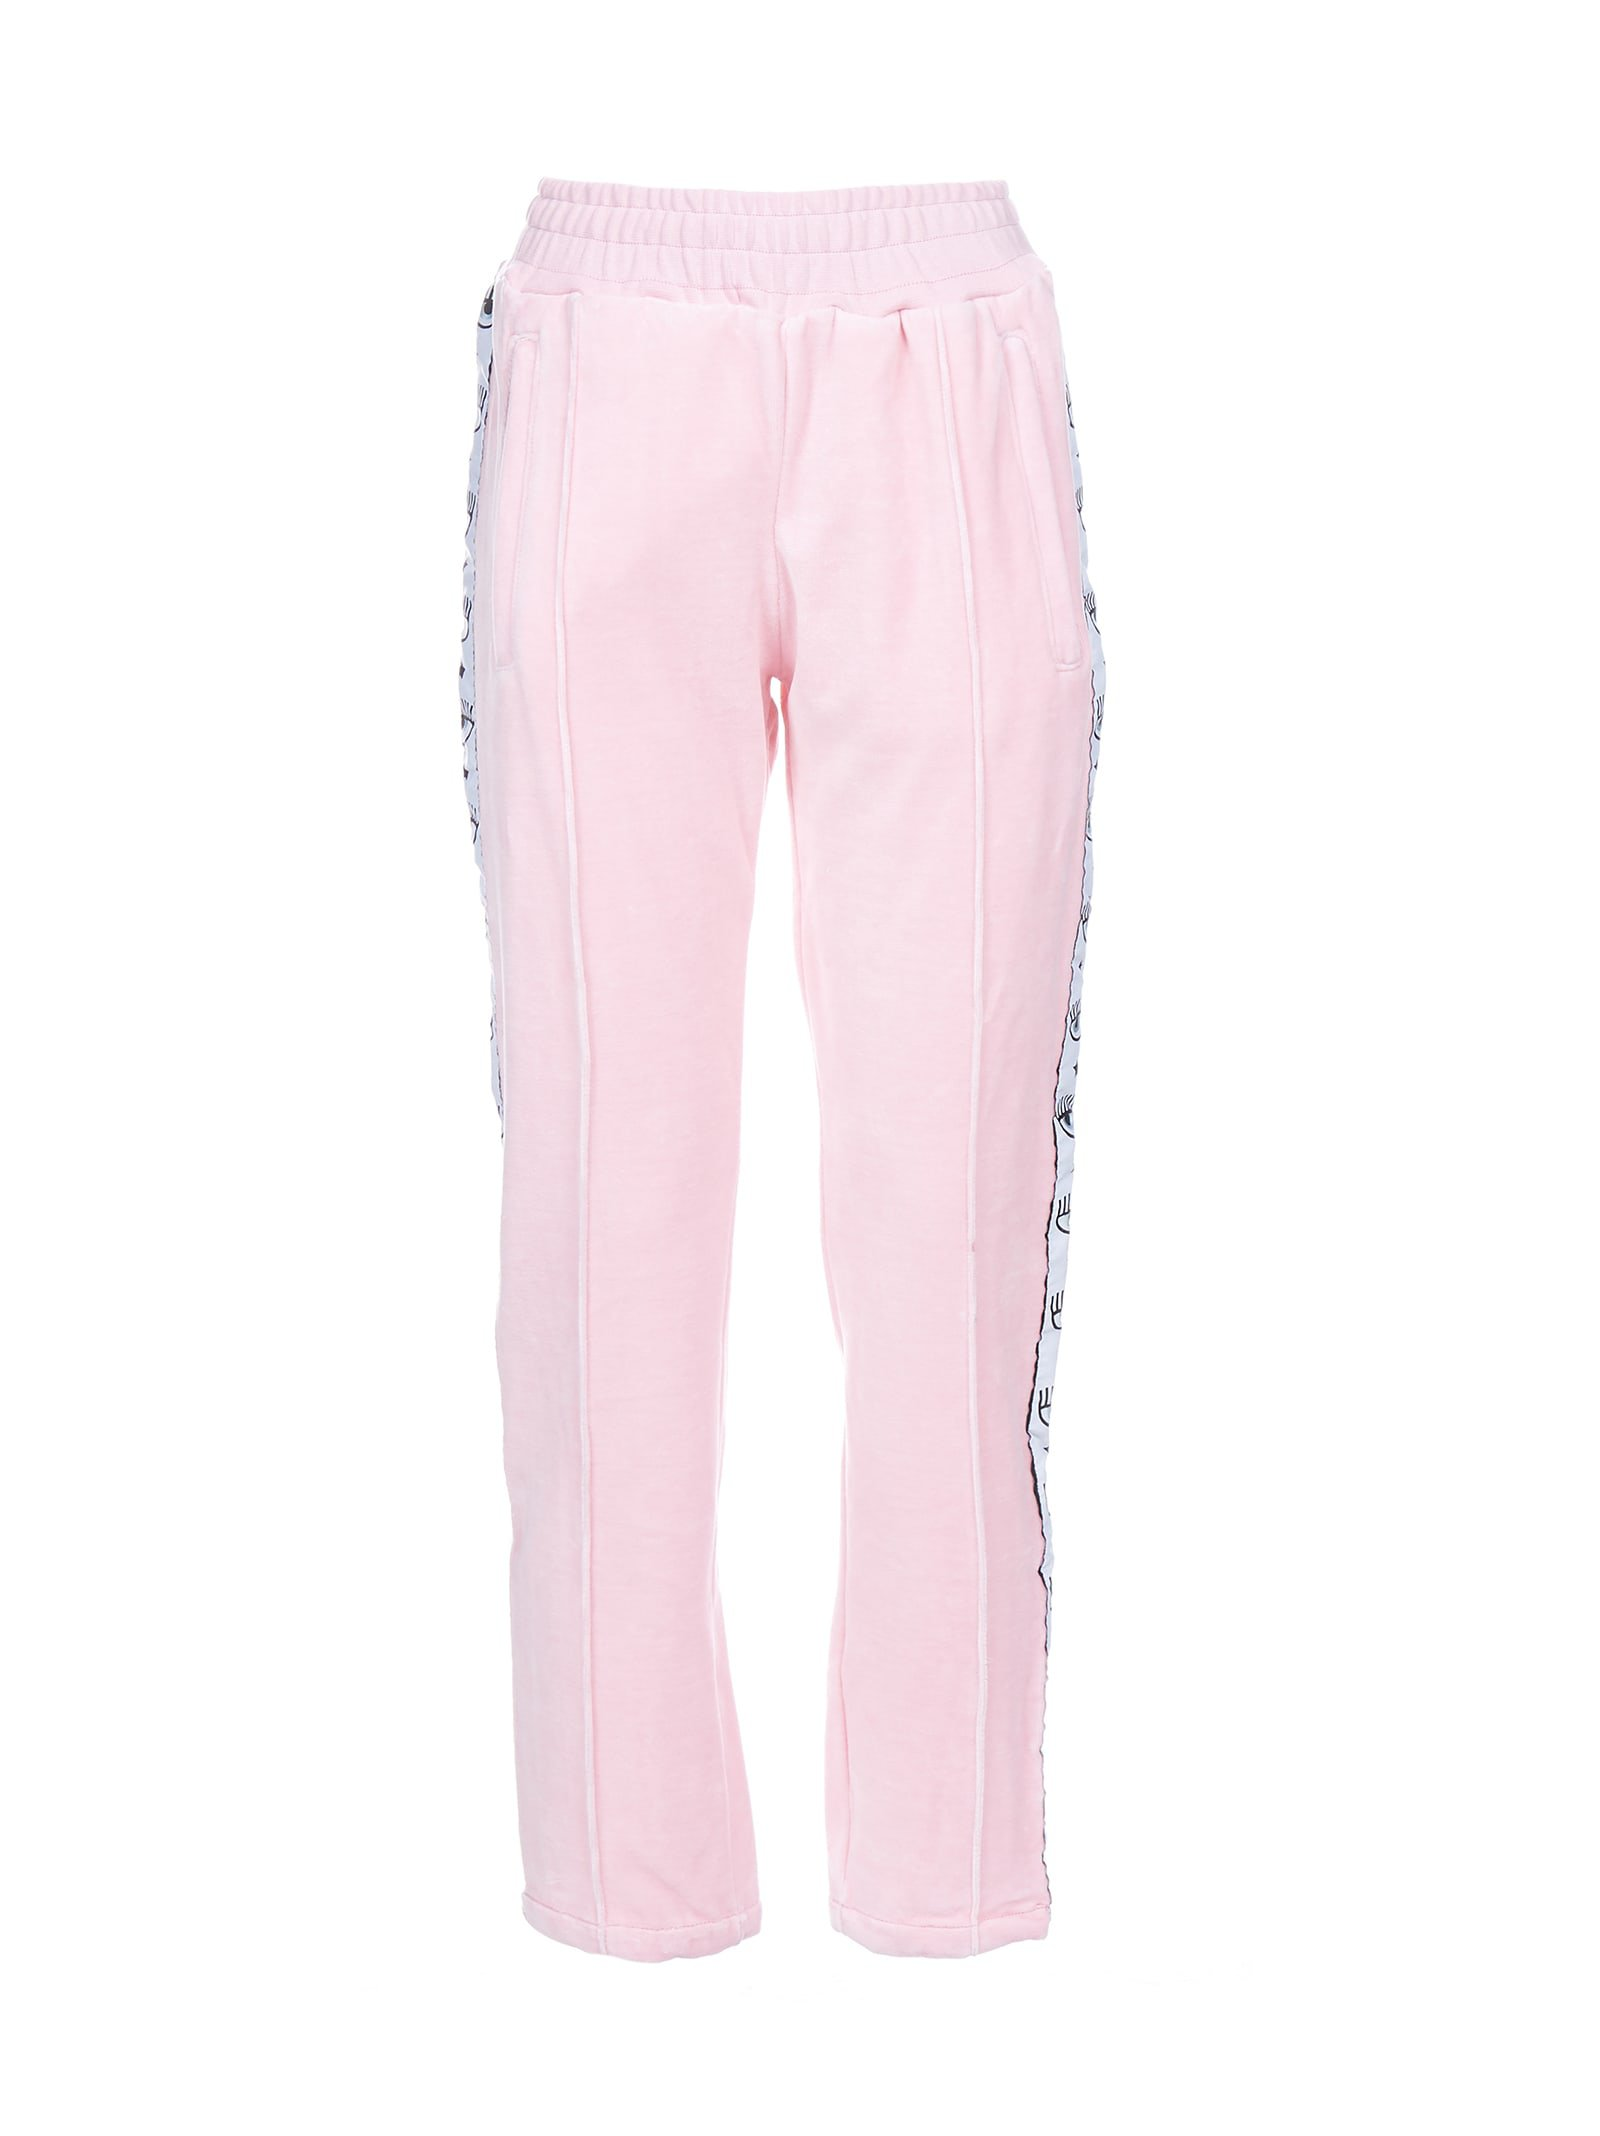 Chiara Ferragni Trousers